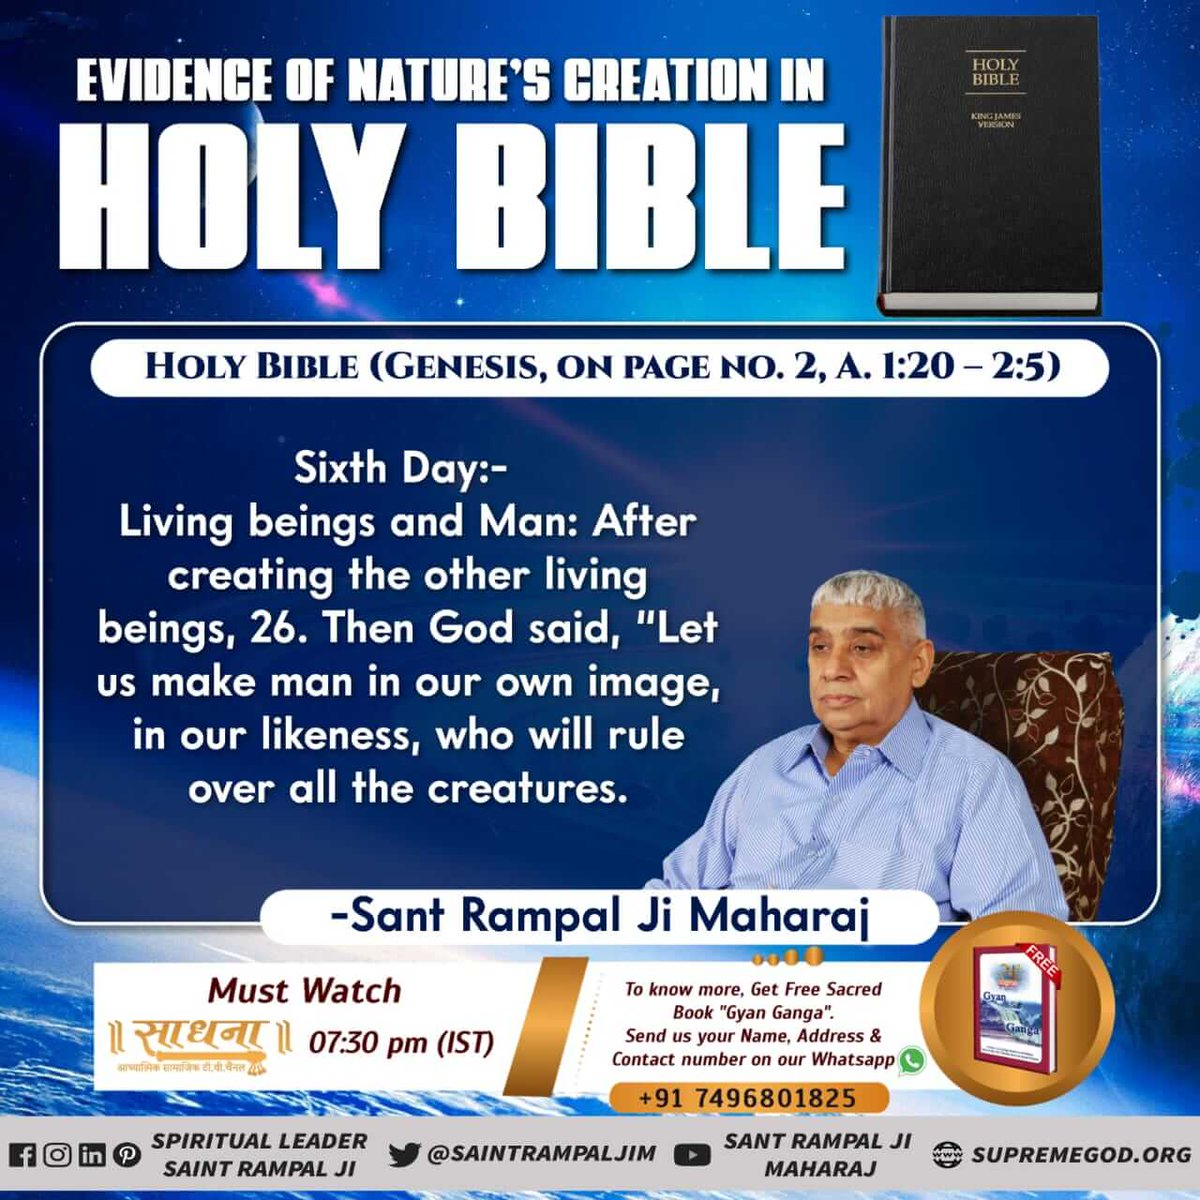 #MondayMotivation #WhoCreatedNature Bible 7 - Song 36: 5 proves that God Kabir is powerful and rational God Kabir is powerful @SaintRampalJiM   #GodMorningMonday  #MondayMotivation